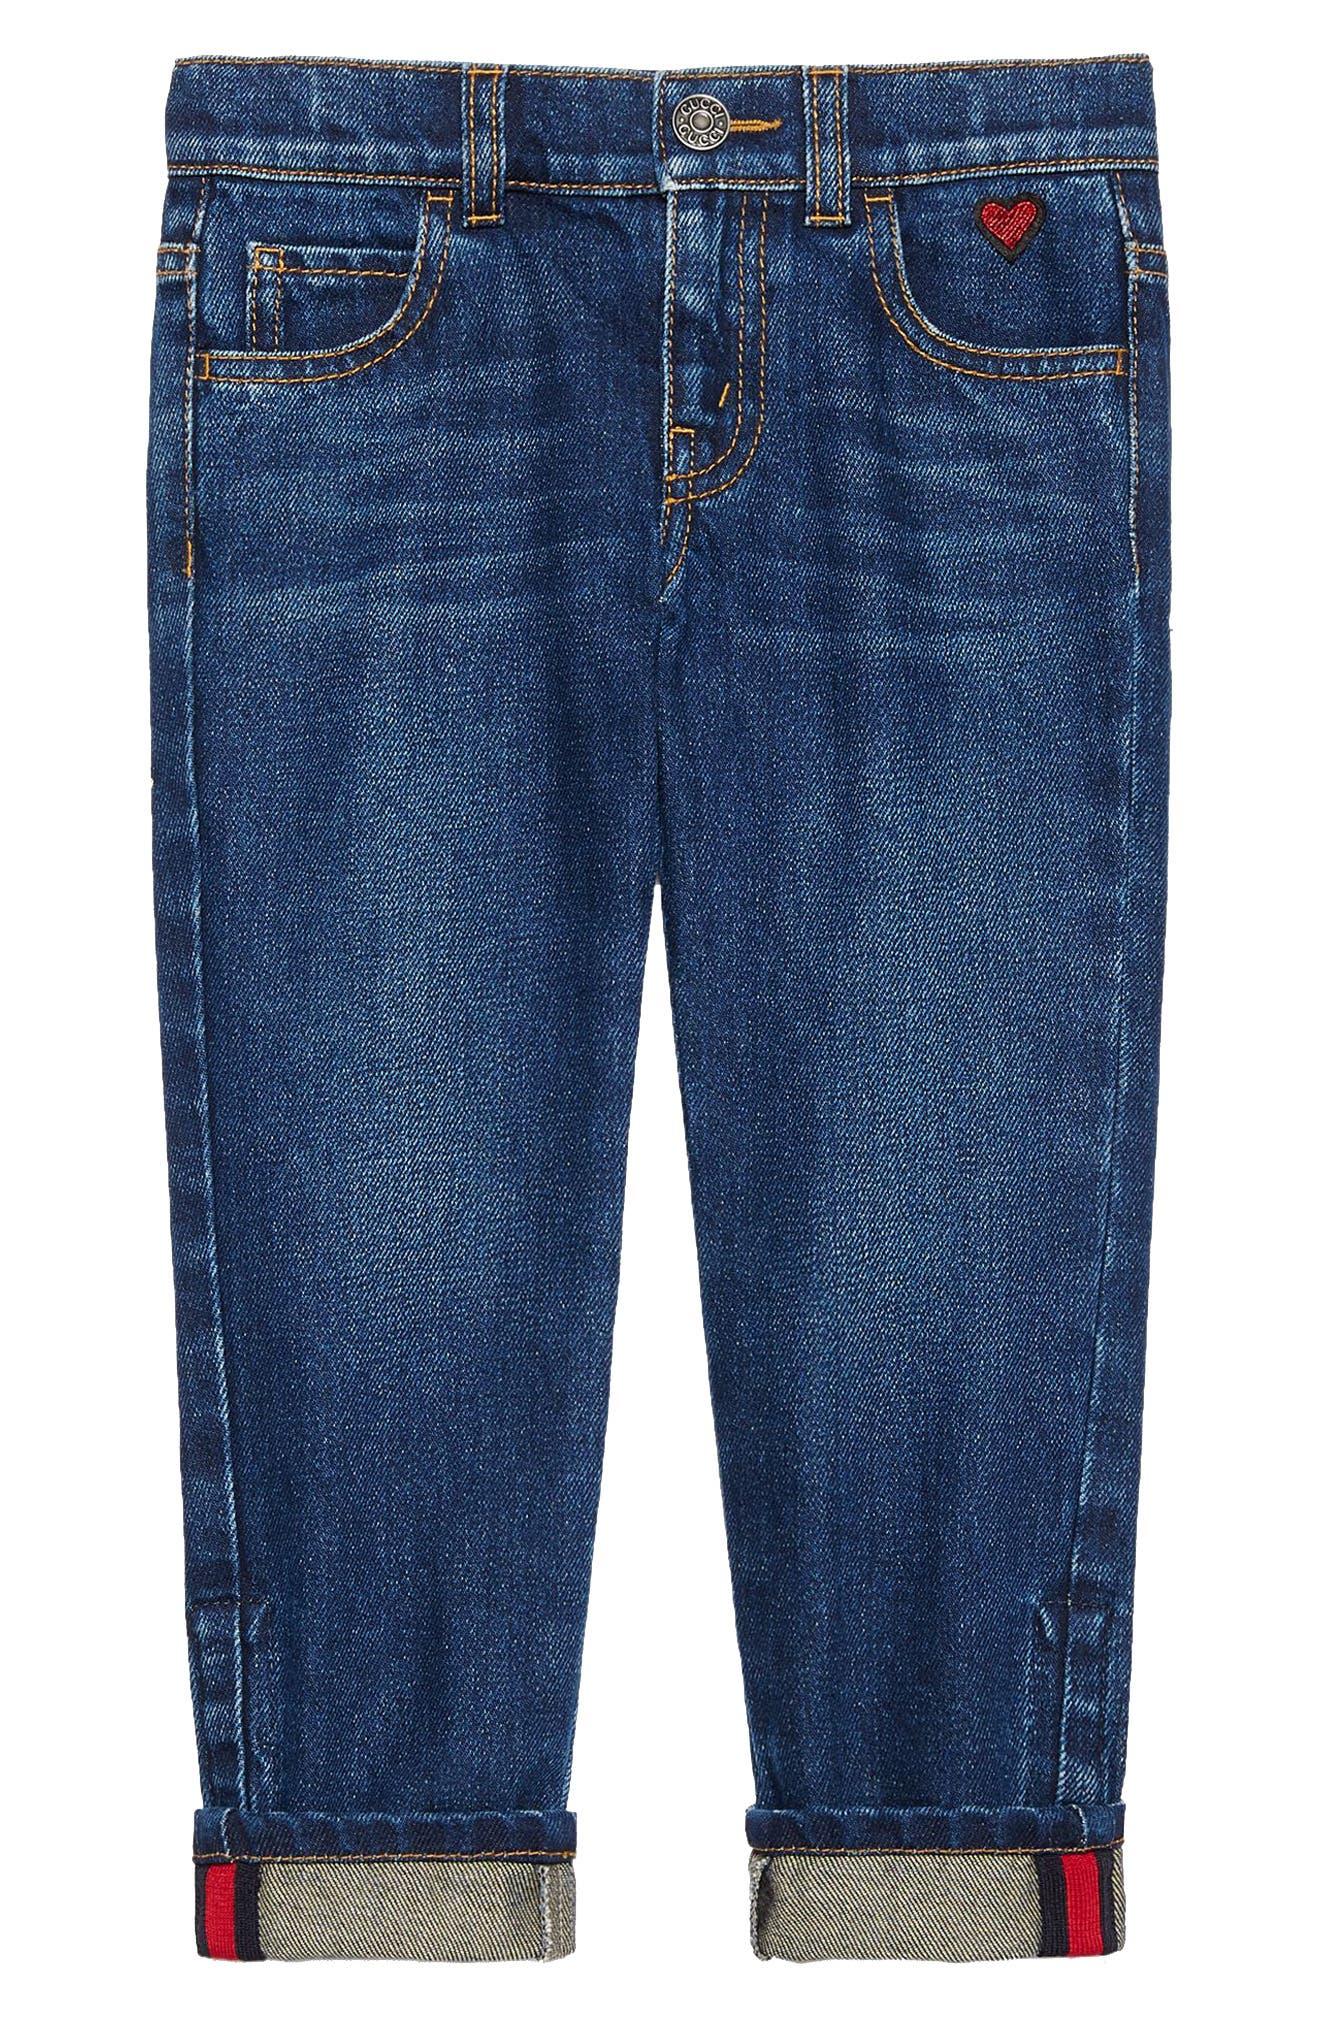 Cuffed Jeans,                             Main thumbnail 1, color,                             ORBIT MULTI